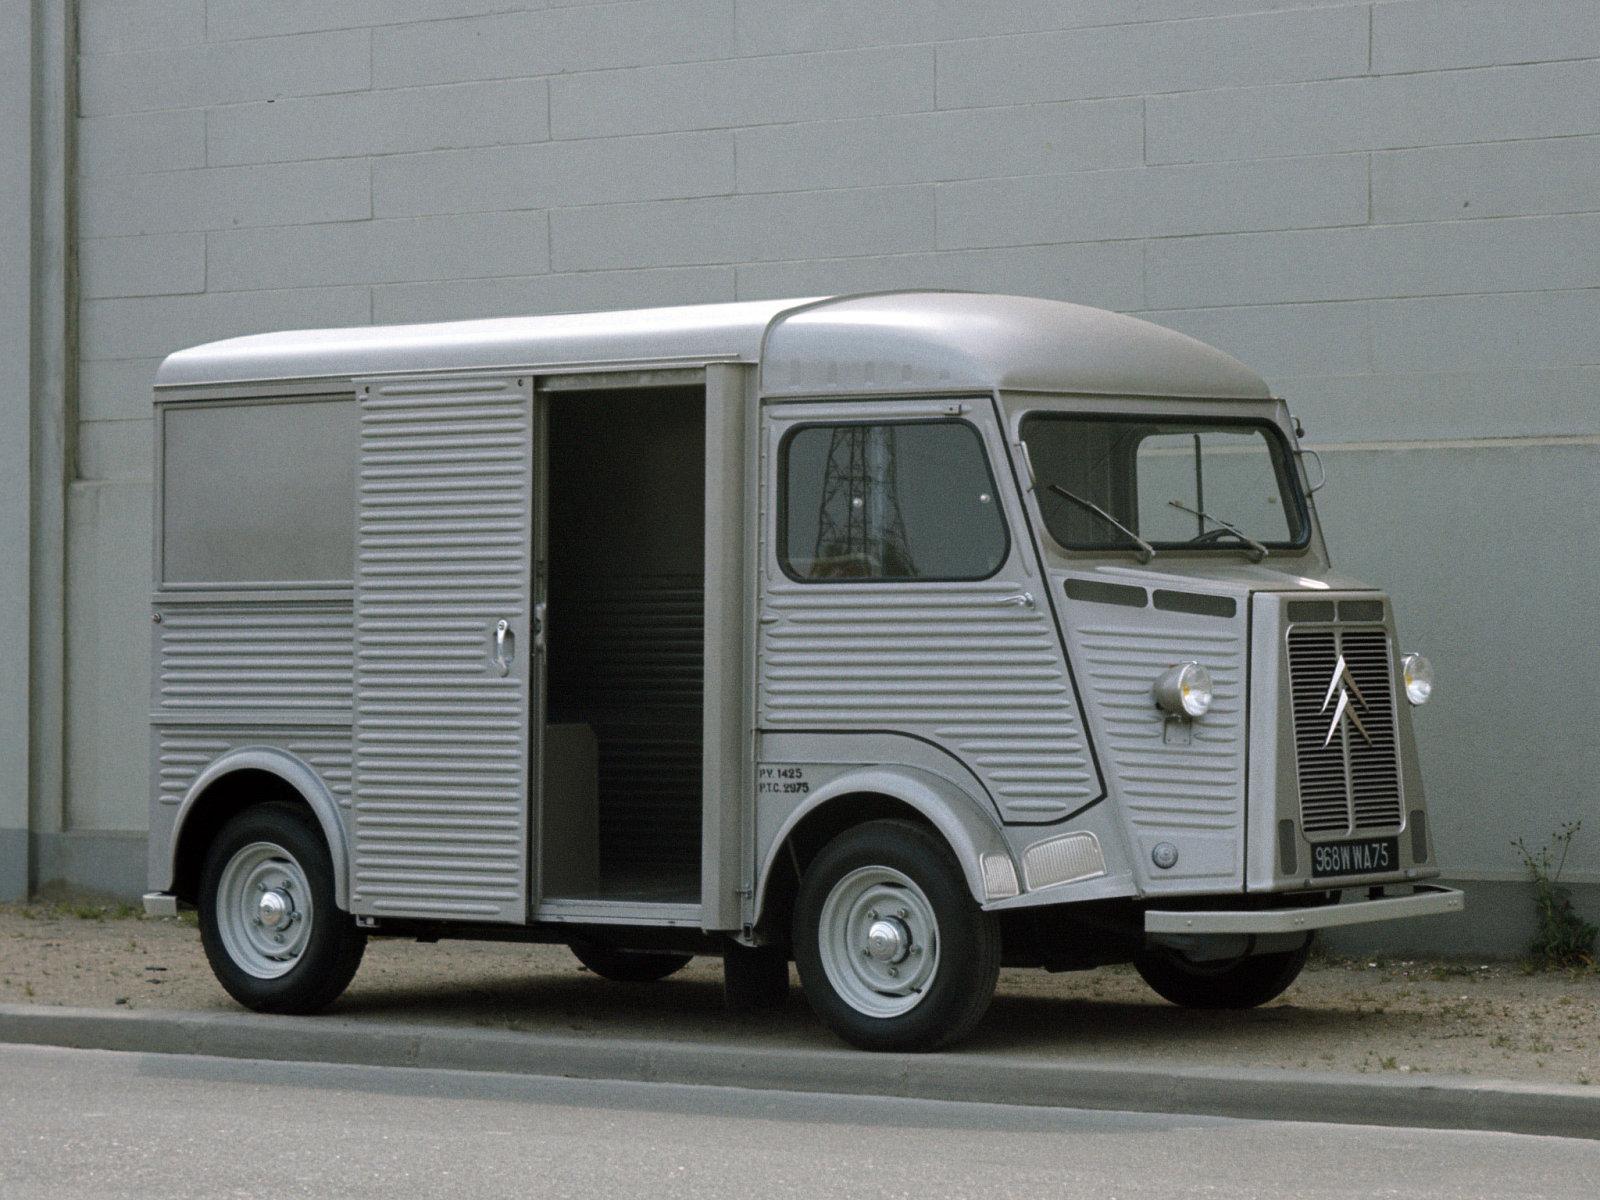 62 Pontiac Parisienne